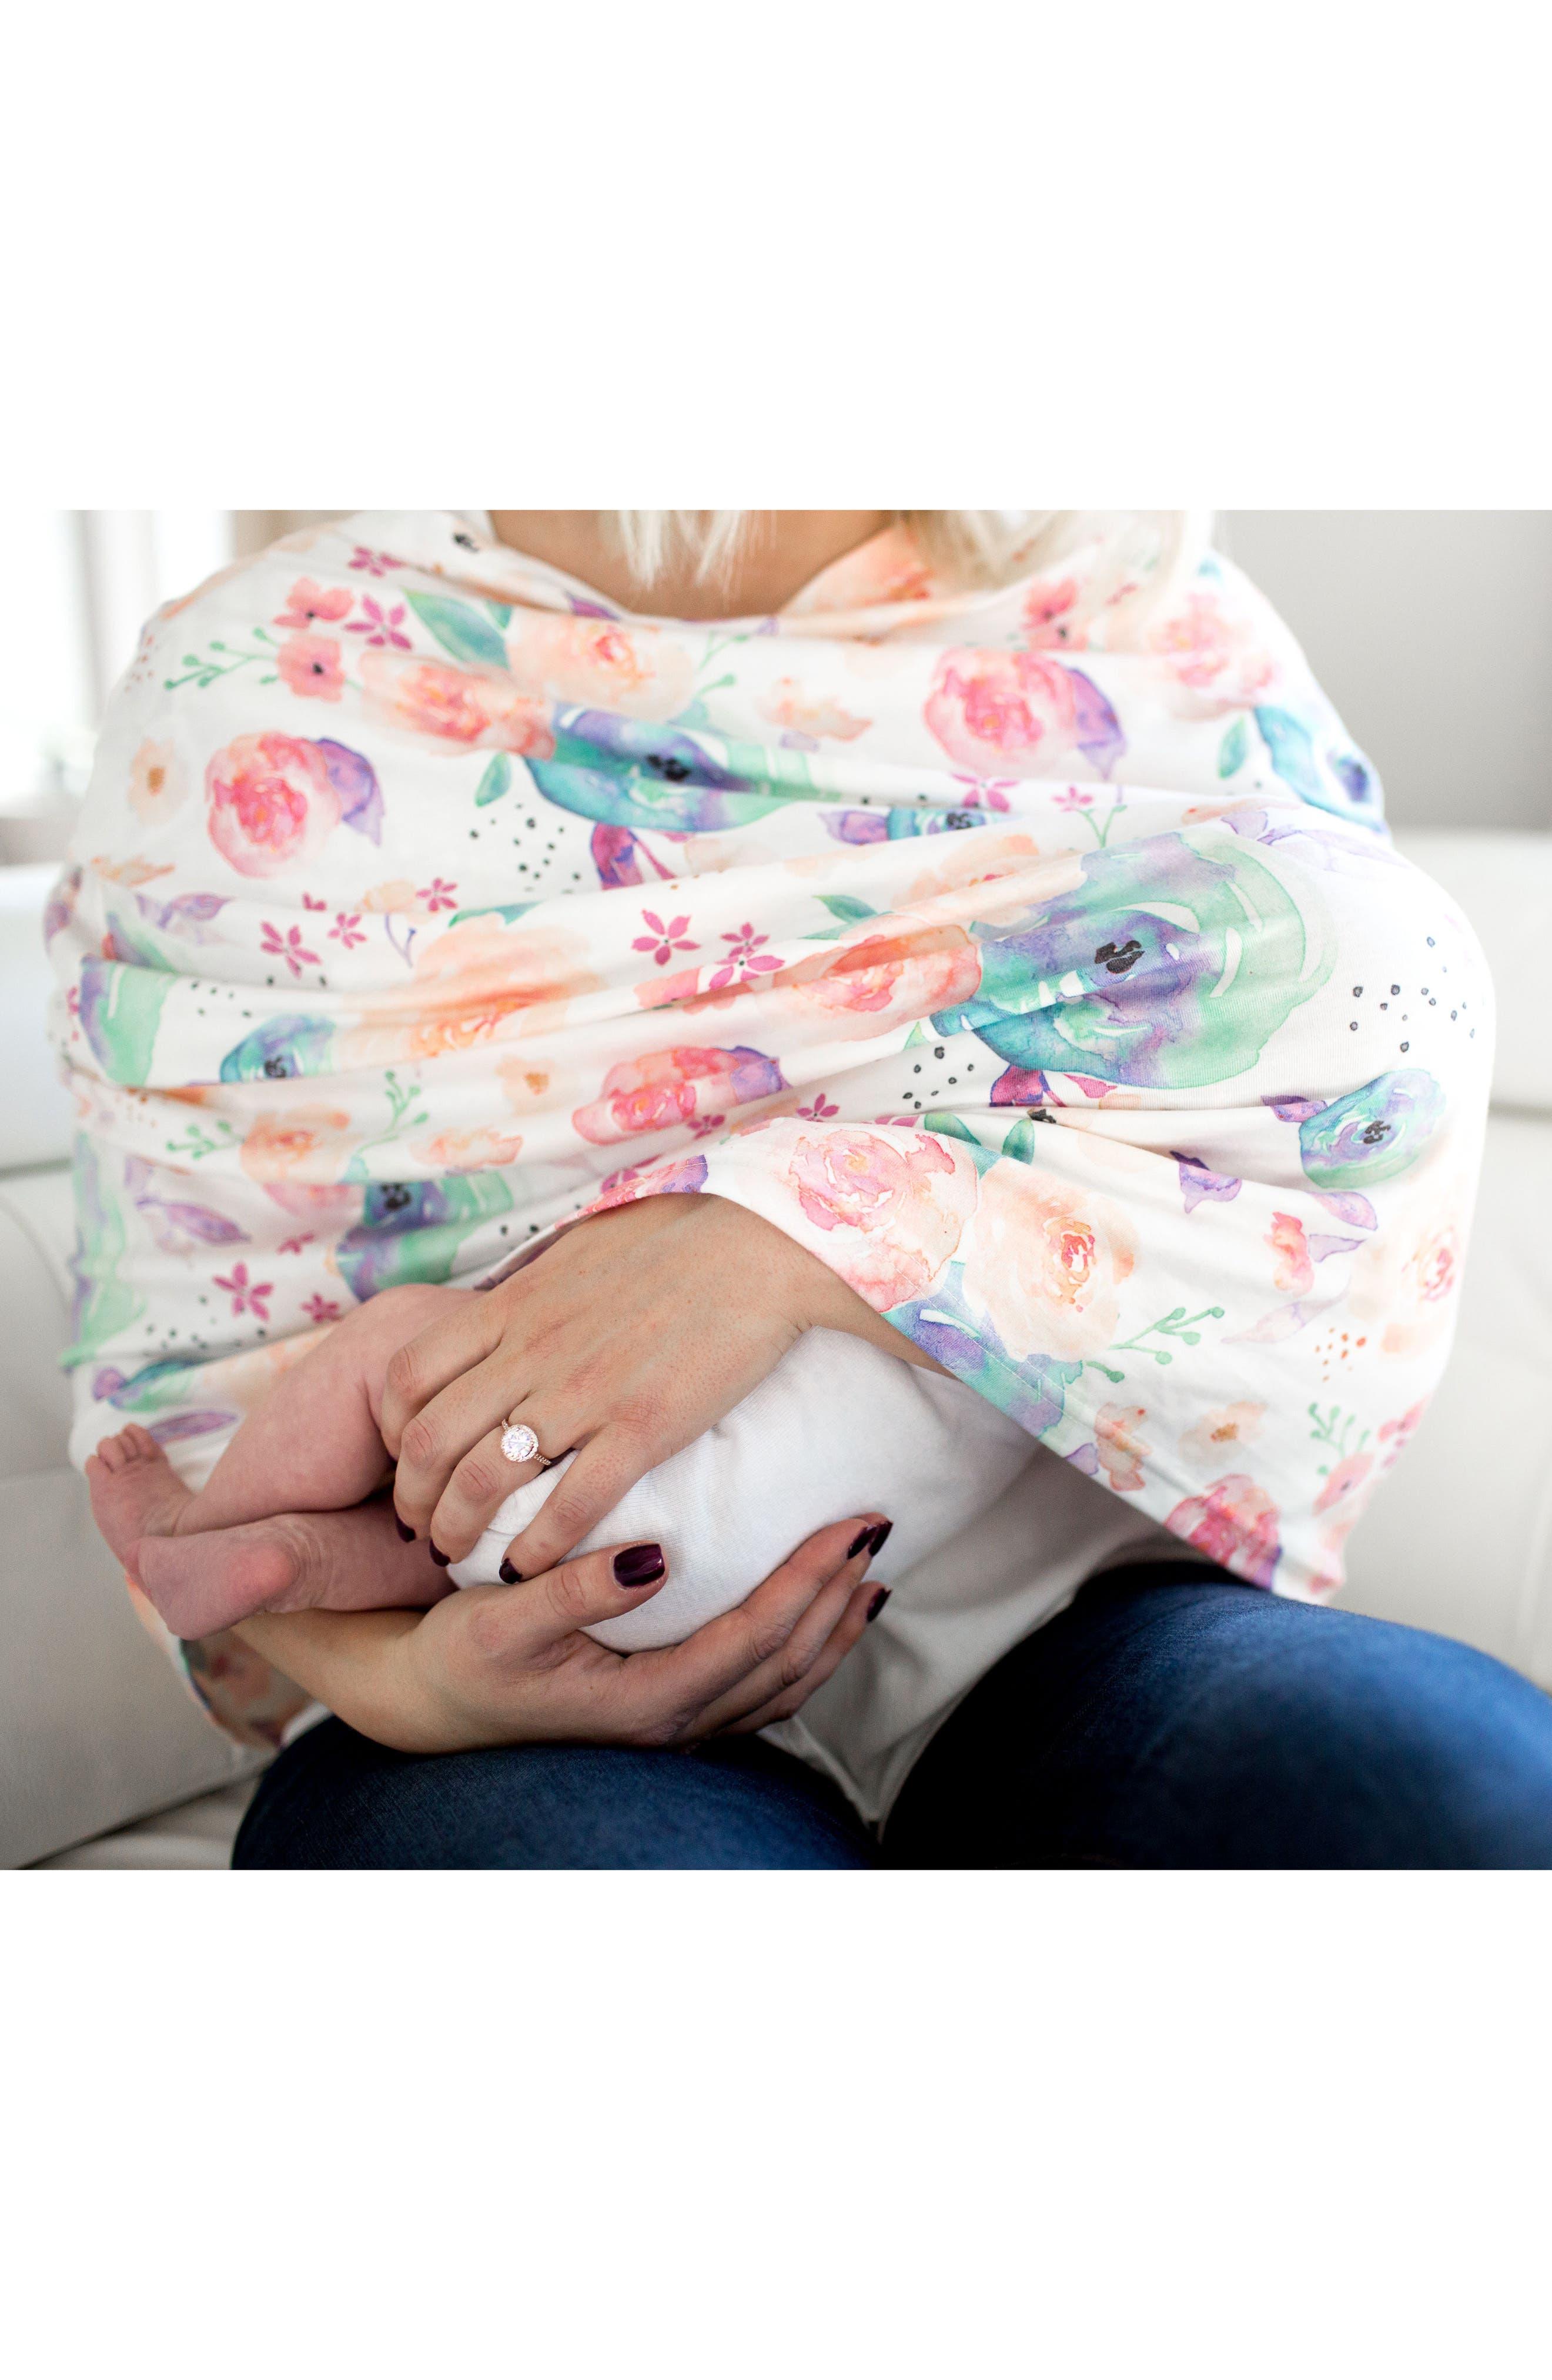 Bloom Multiuse Cover & Swaddle Blanket Gift Set,                             Alternate thumbnail 13, color,                             Bloom